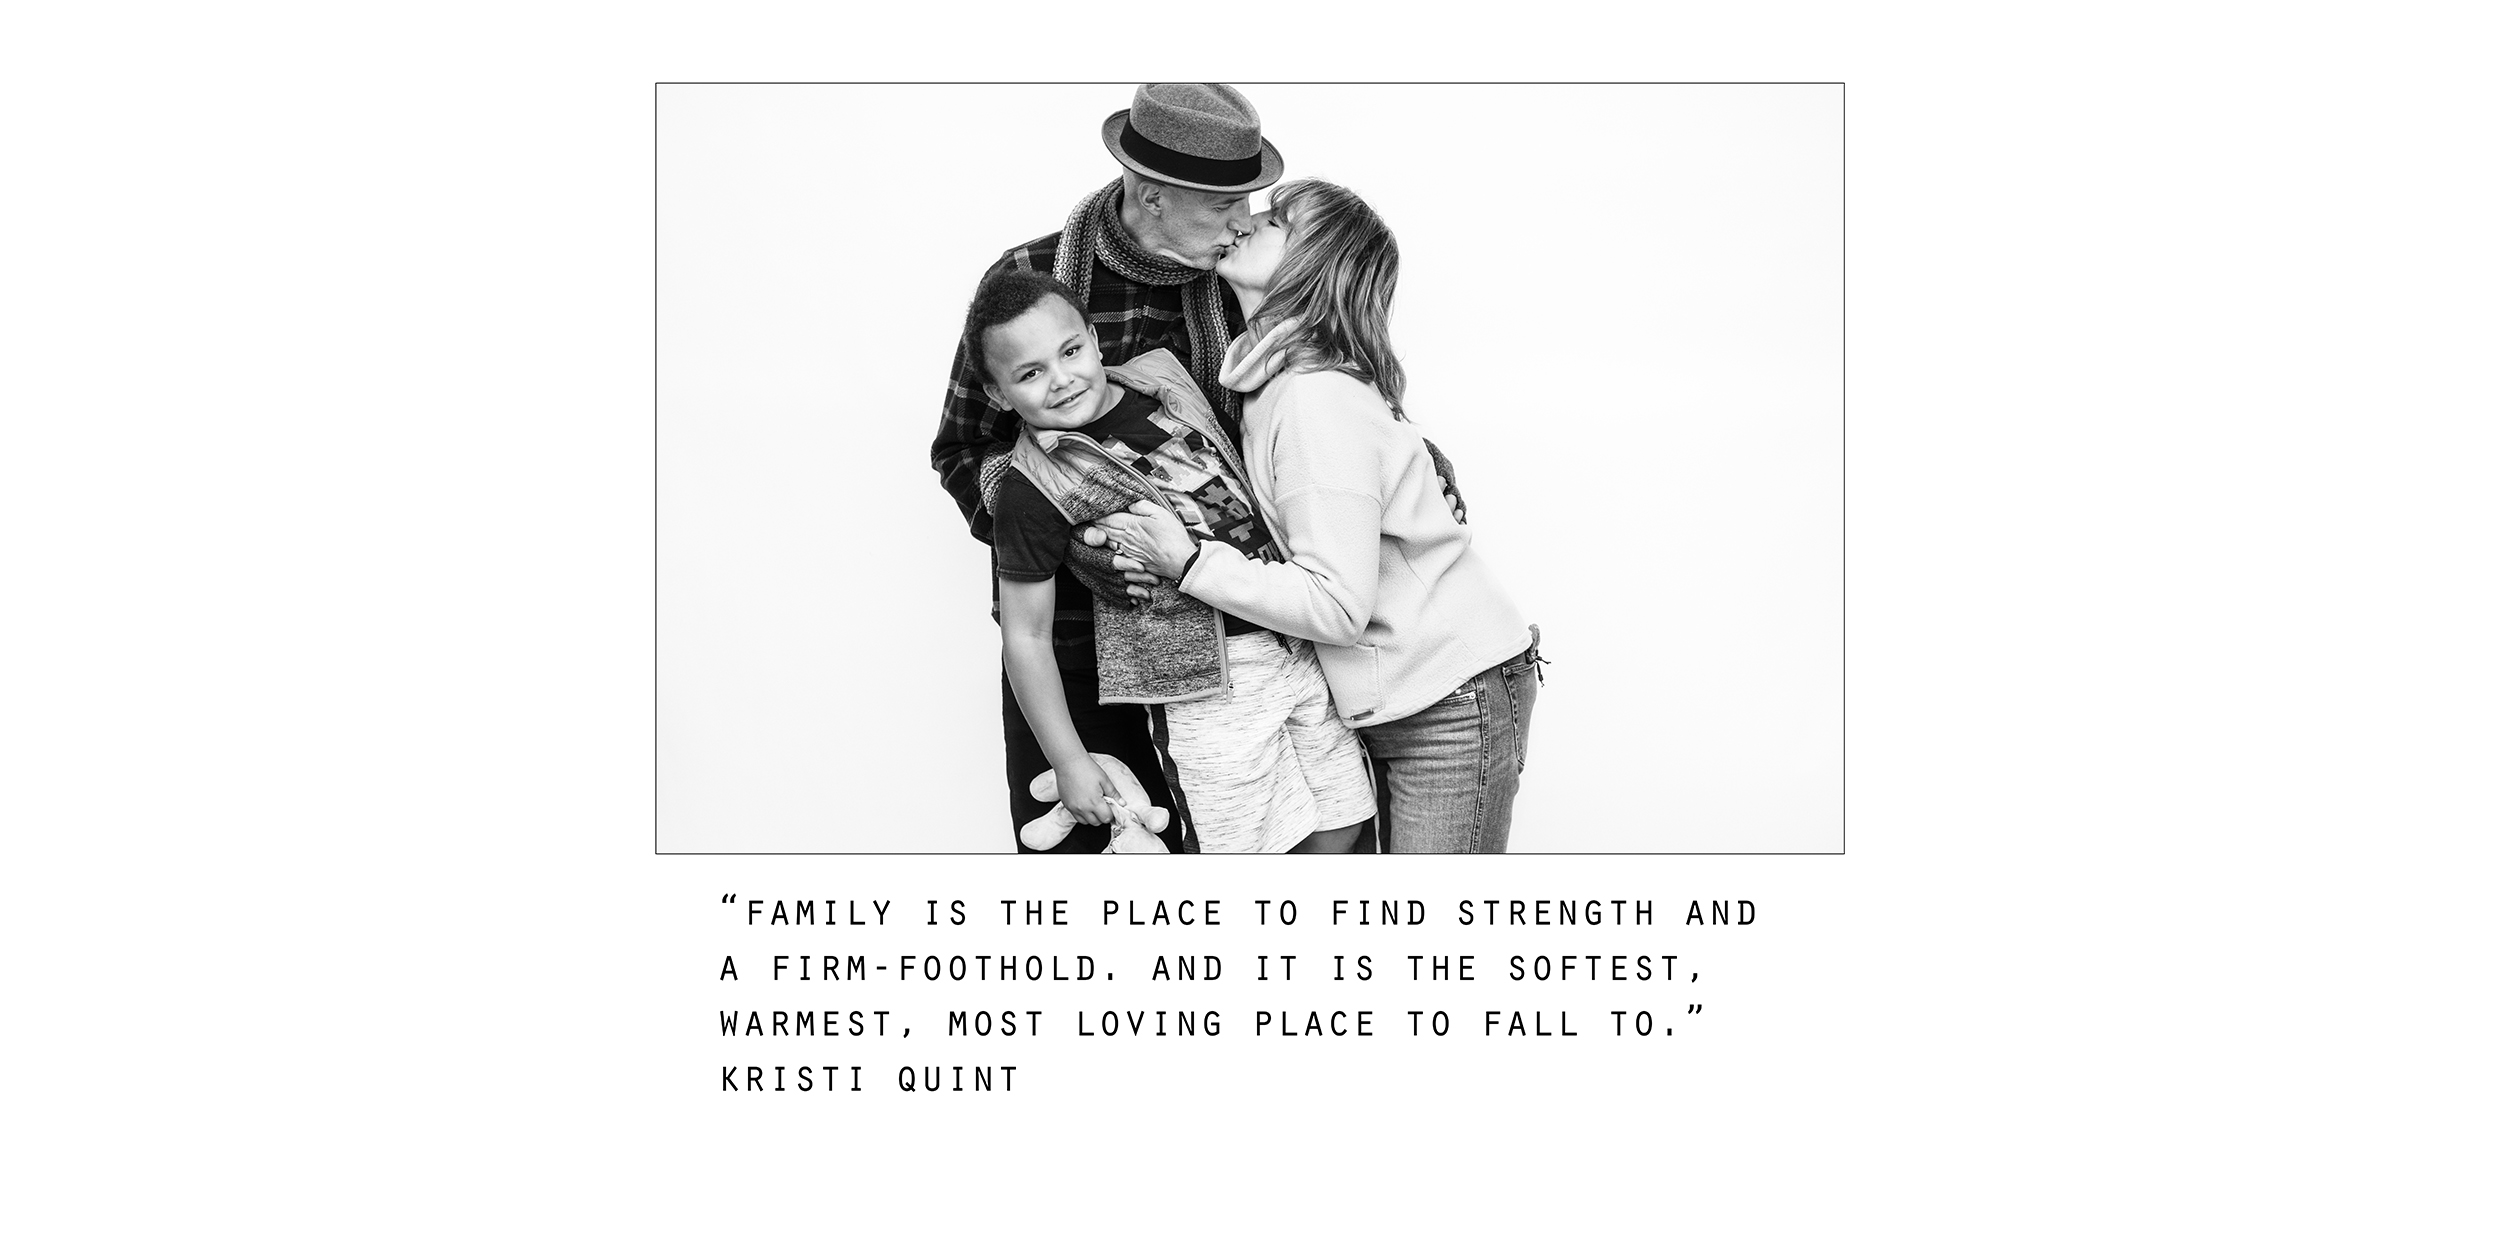 46-30-48-KristiQuint,